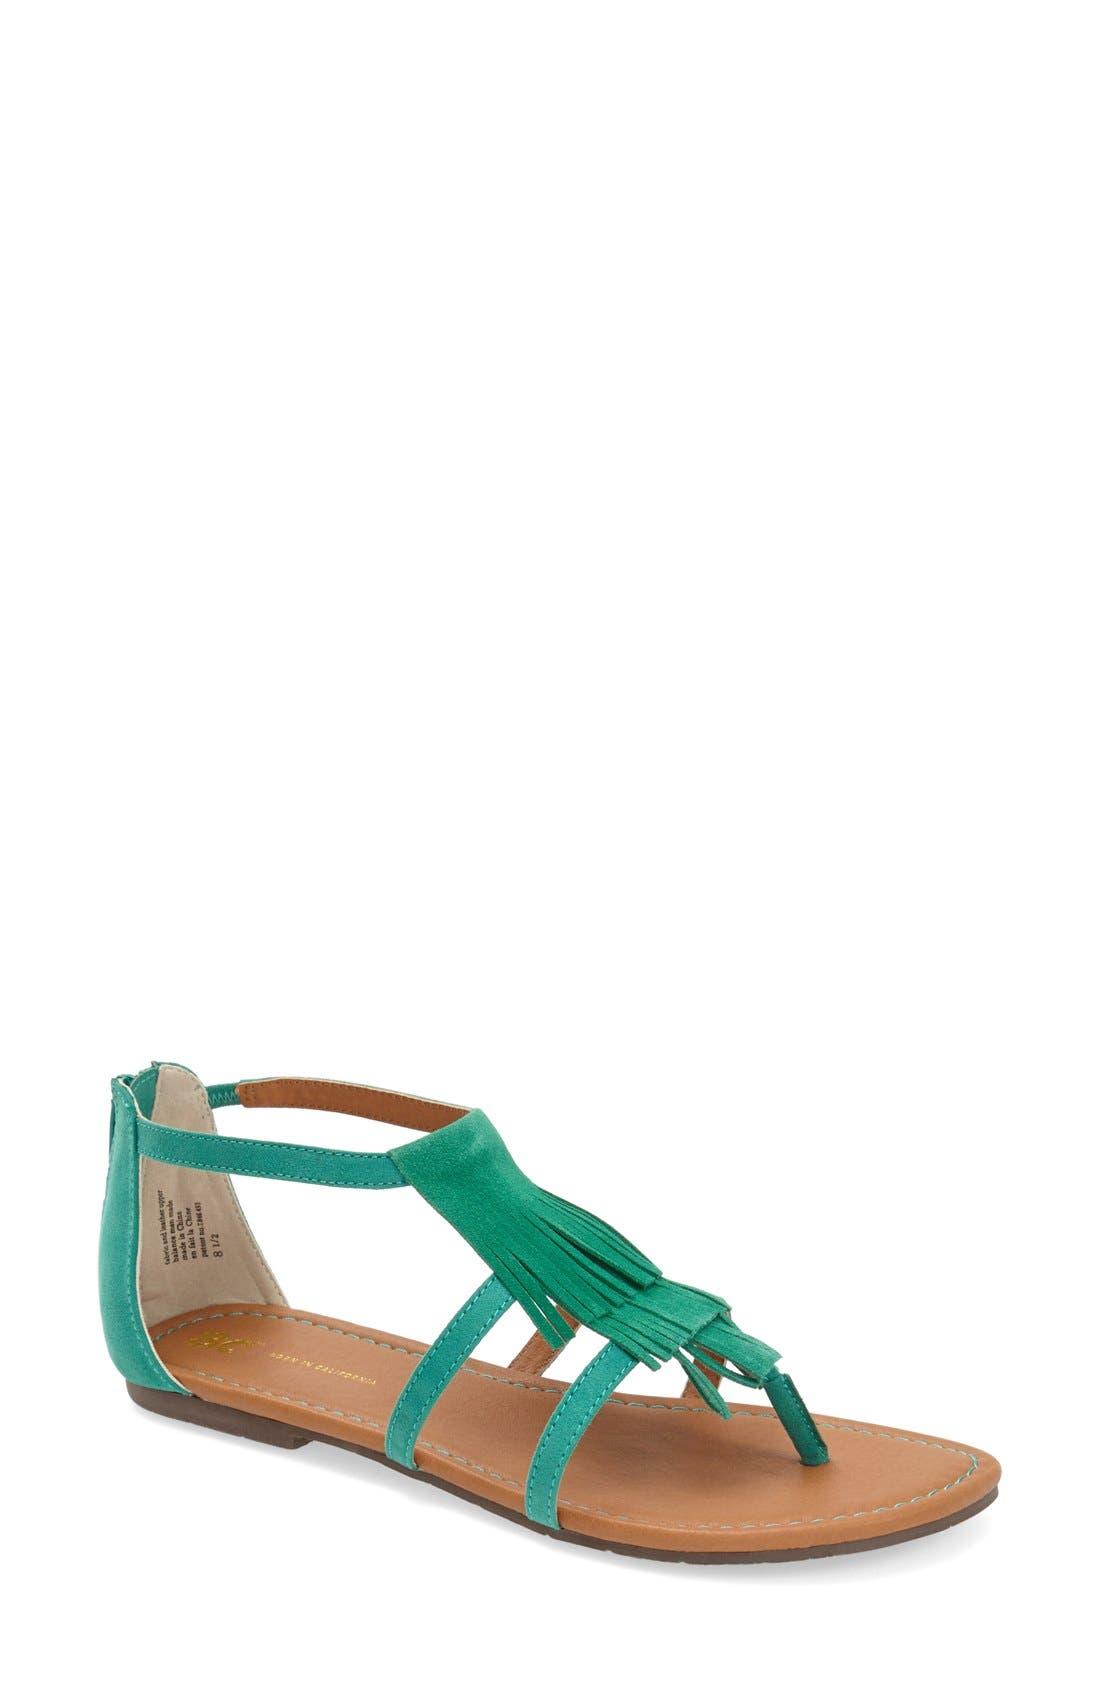 Alternate Image 1 Selected - BC Footwear 'Maltese' Fringe Sandal (Women)